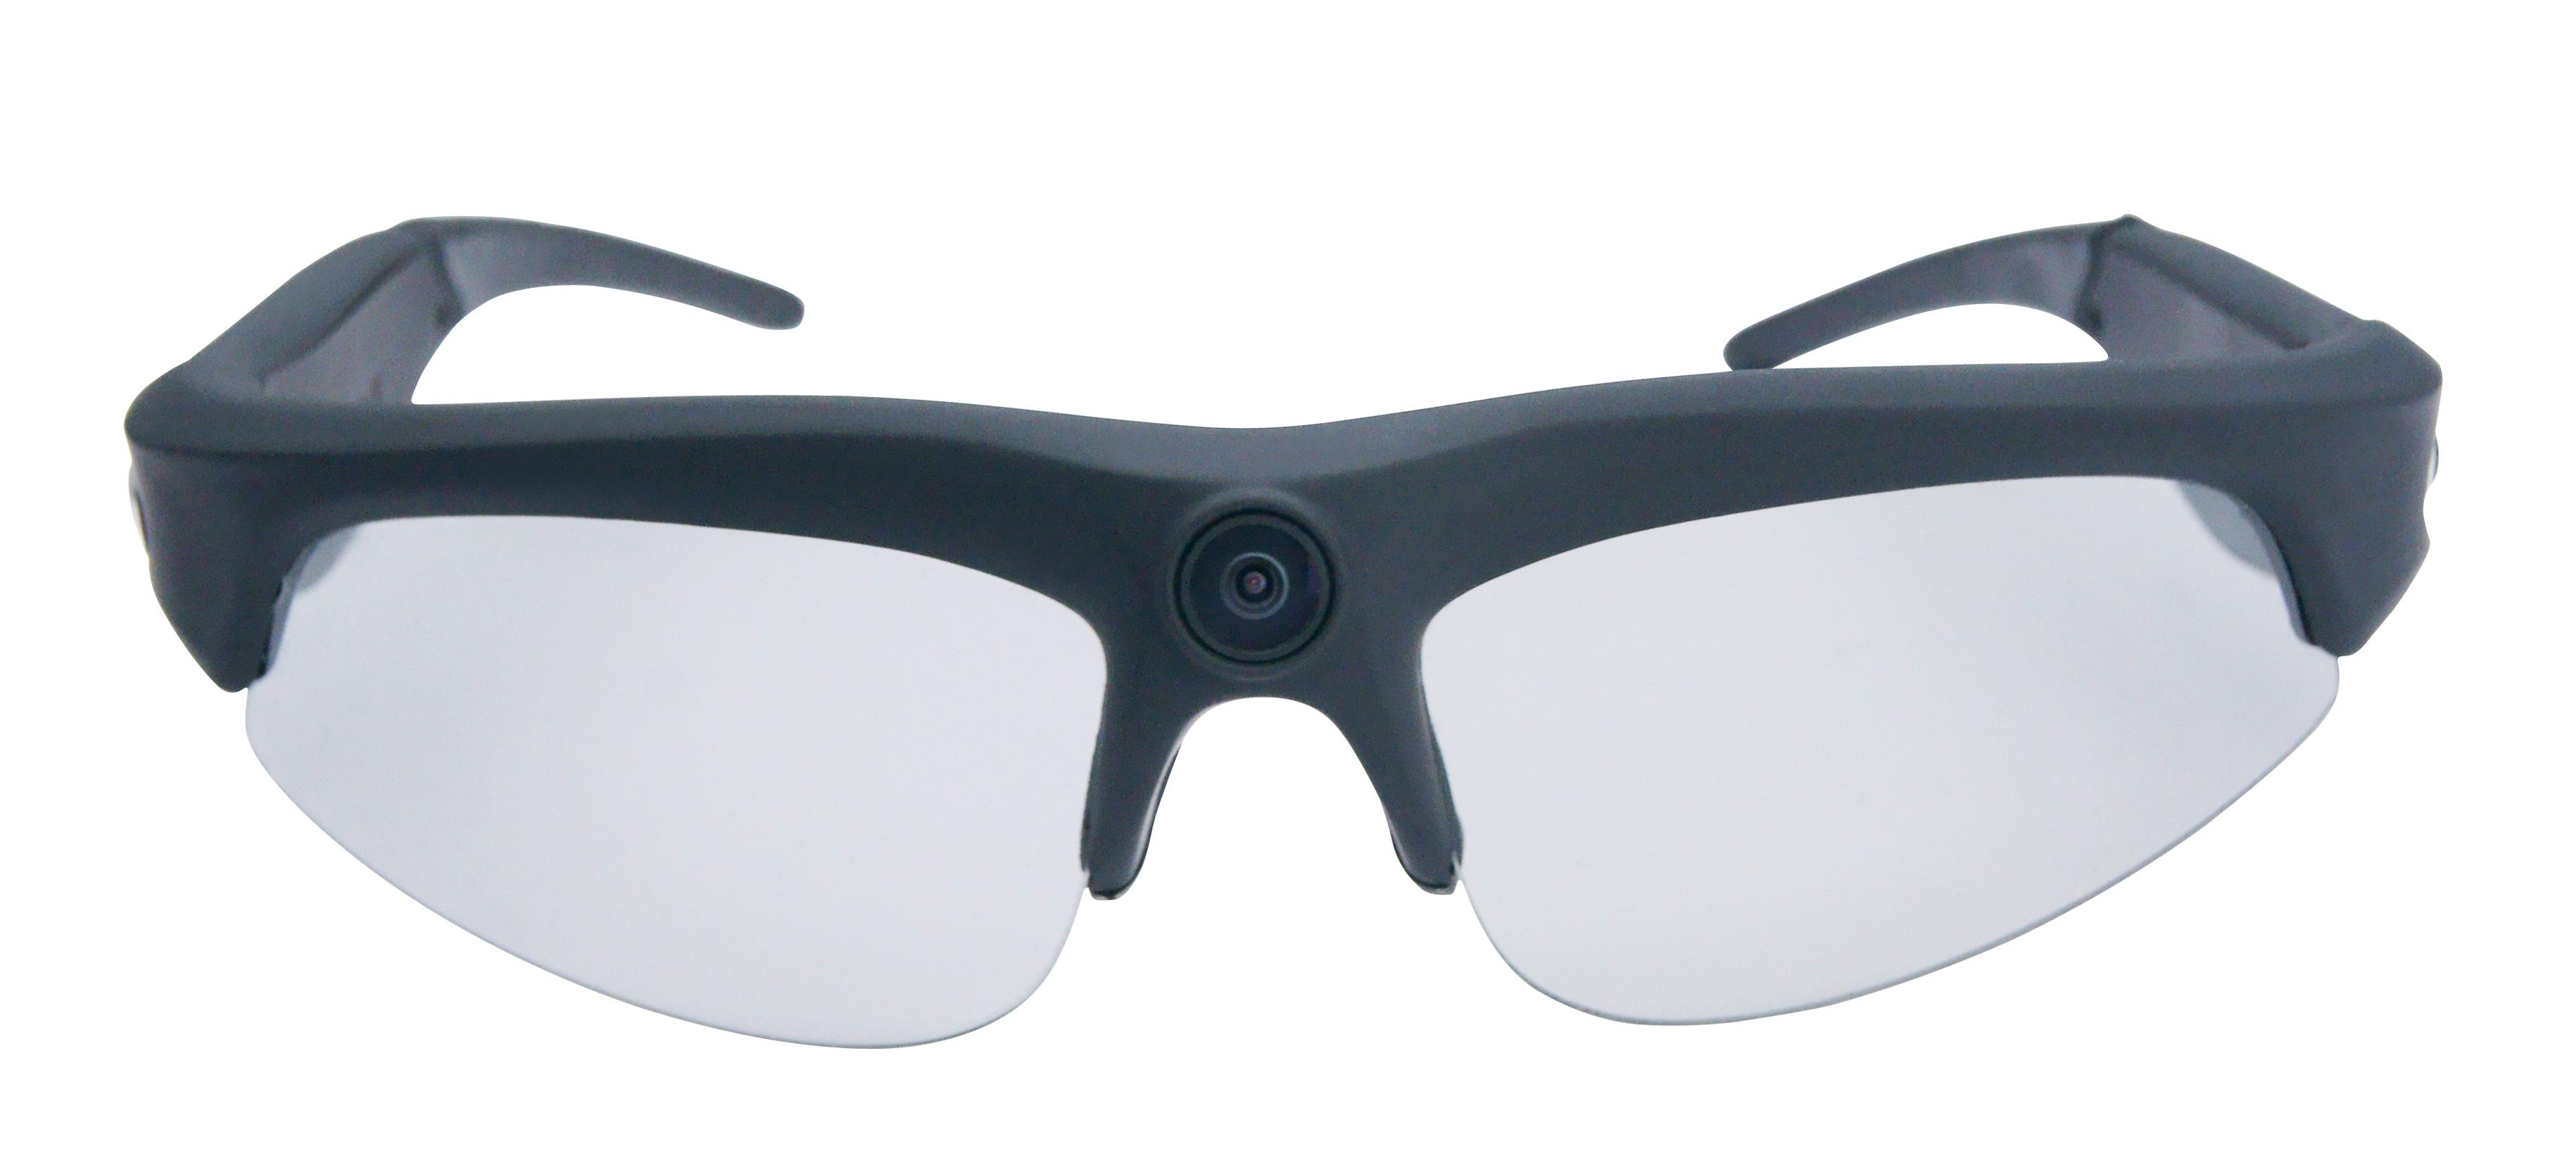 HD 720P Sunglasses Covert Video Camera Eye Glasses - Wide Angle ...